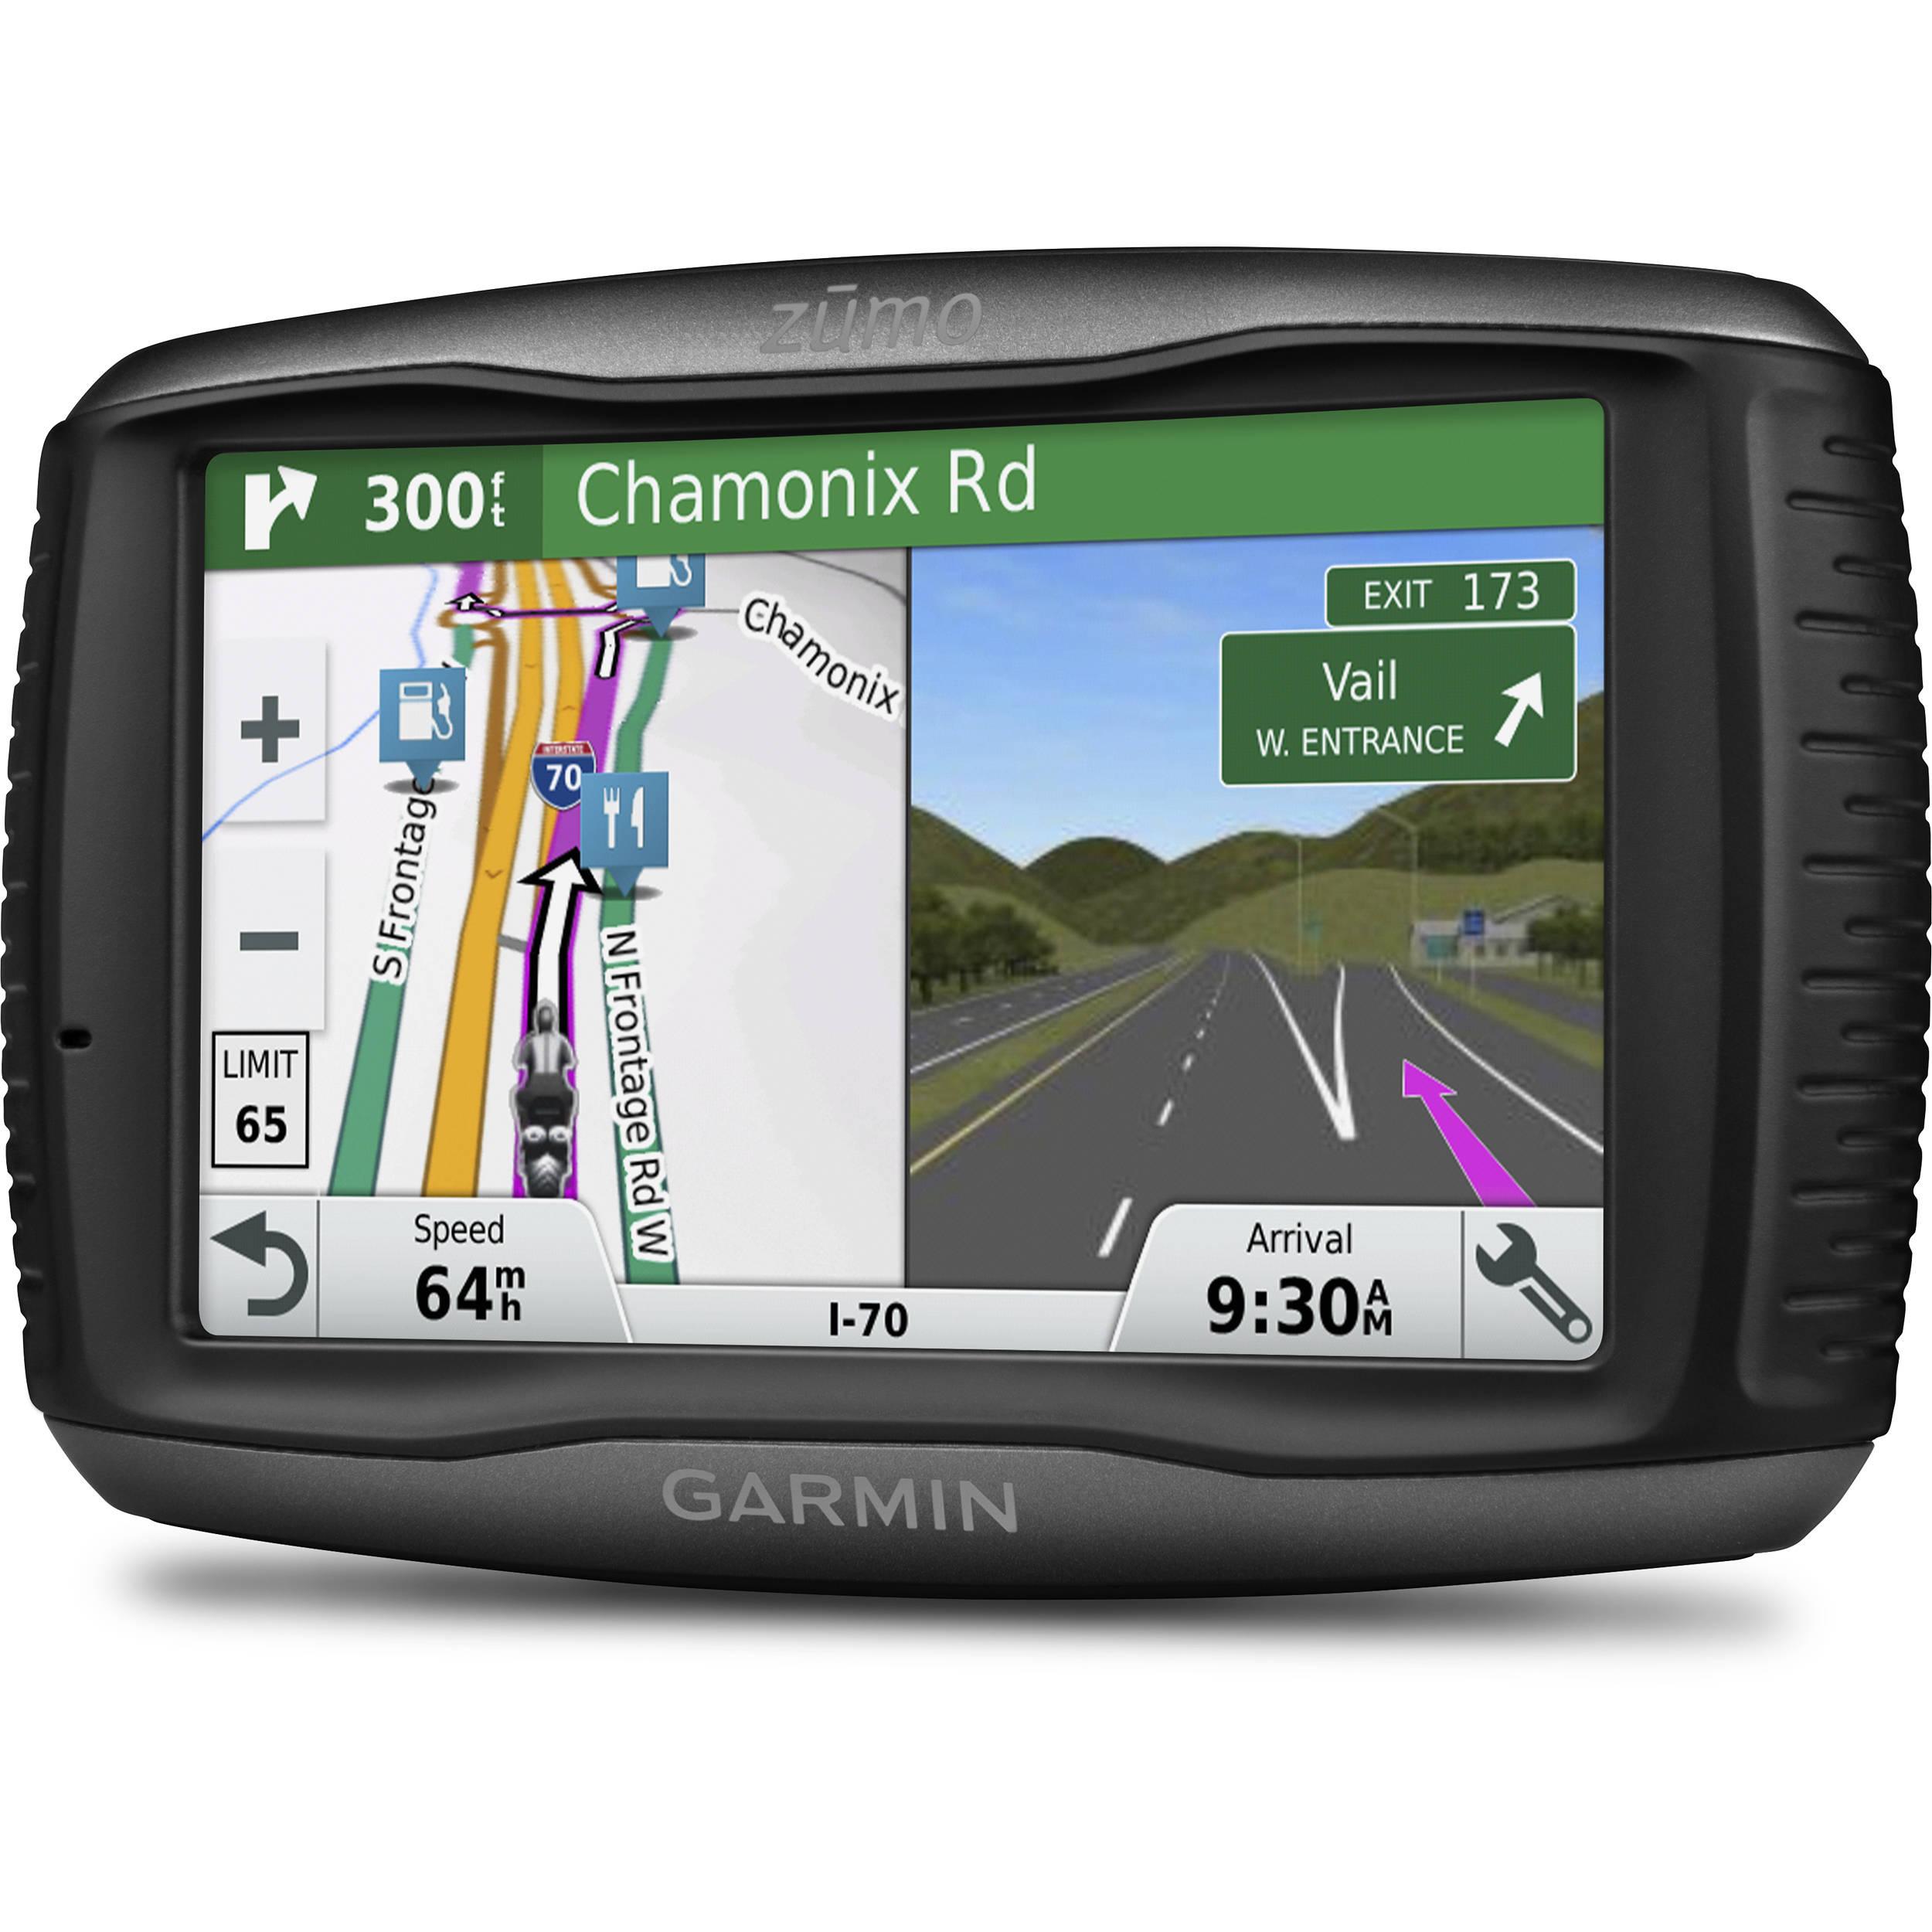 09b0e0d40d1 Garmin zumo 595LM GPS System 010-01603-00 B&H Photo Video